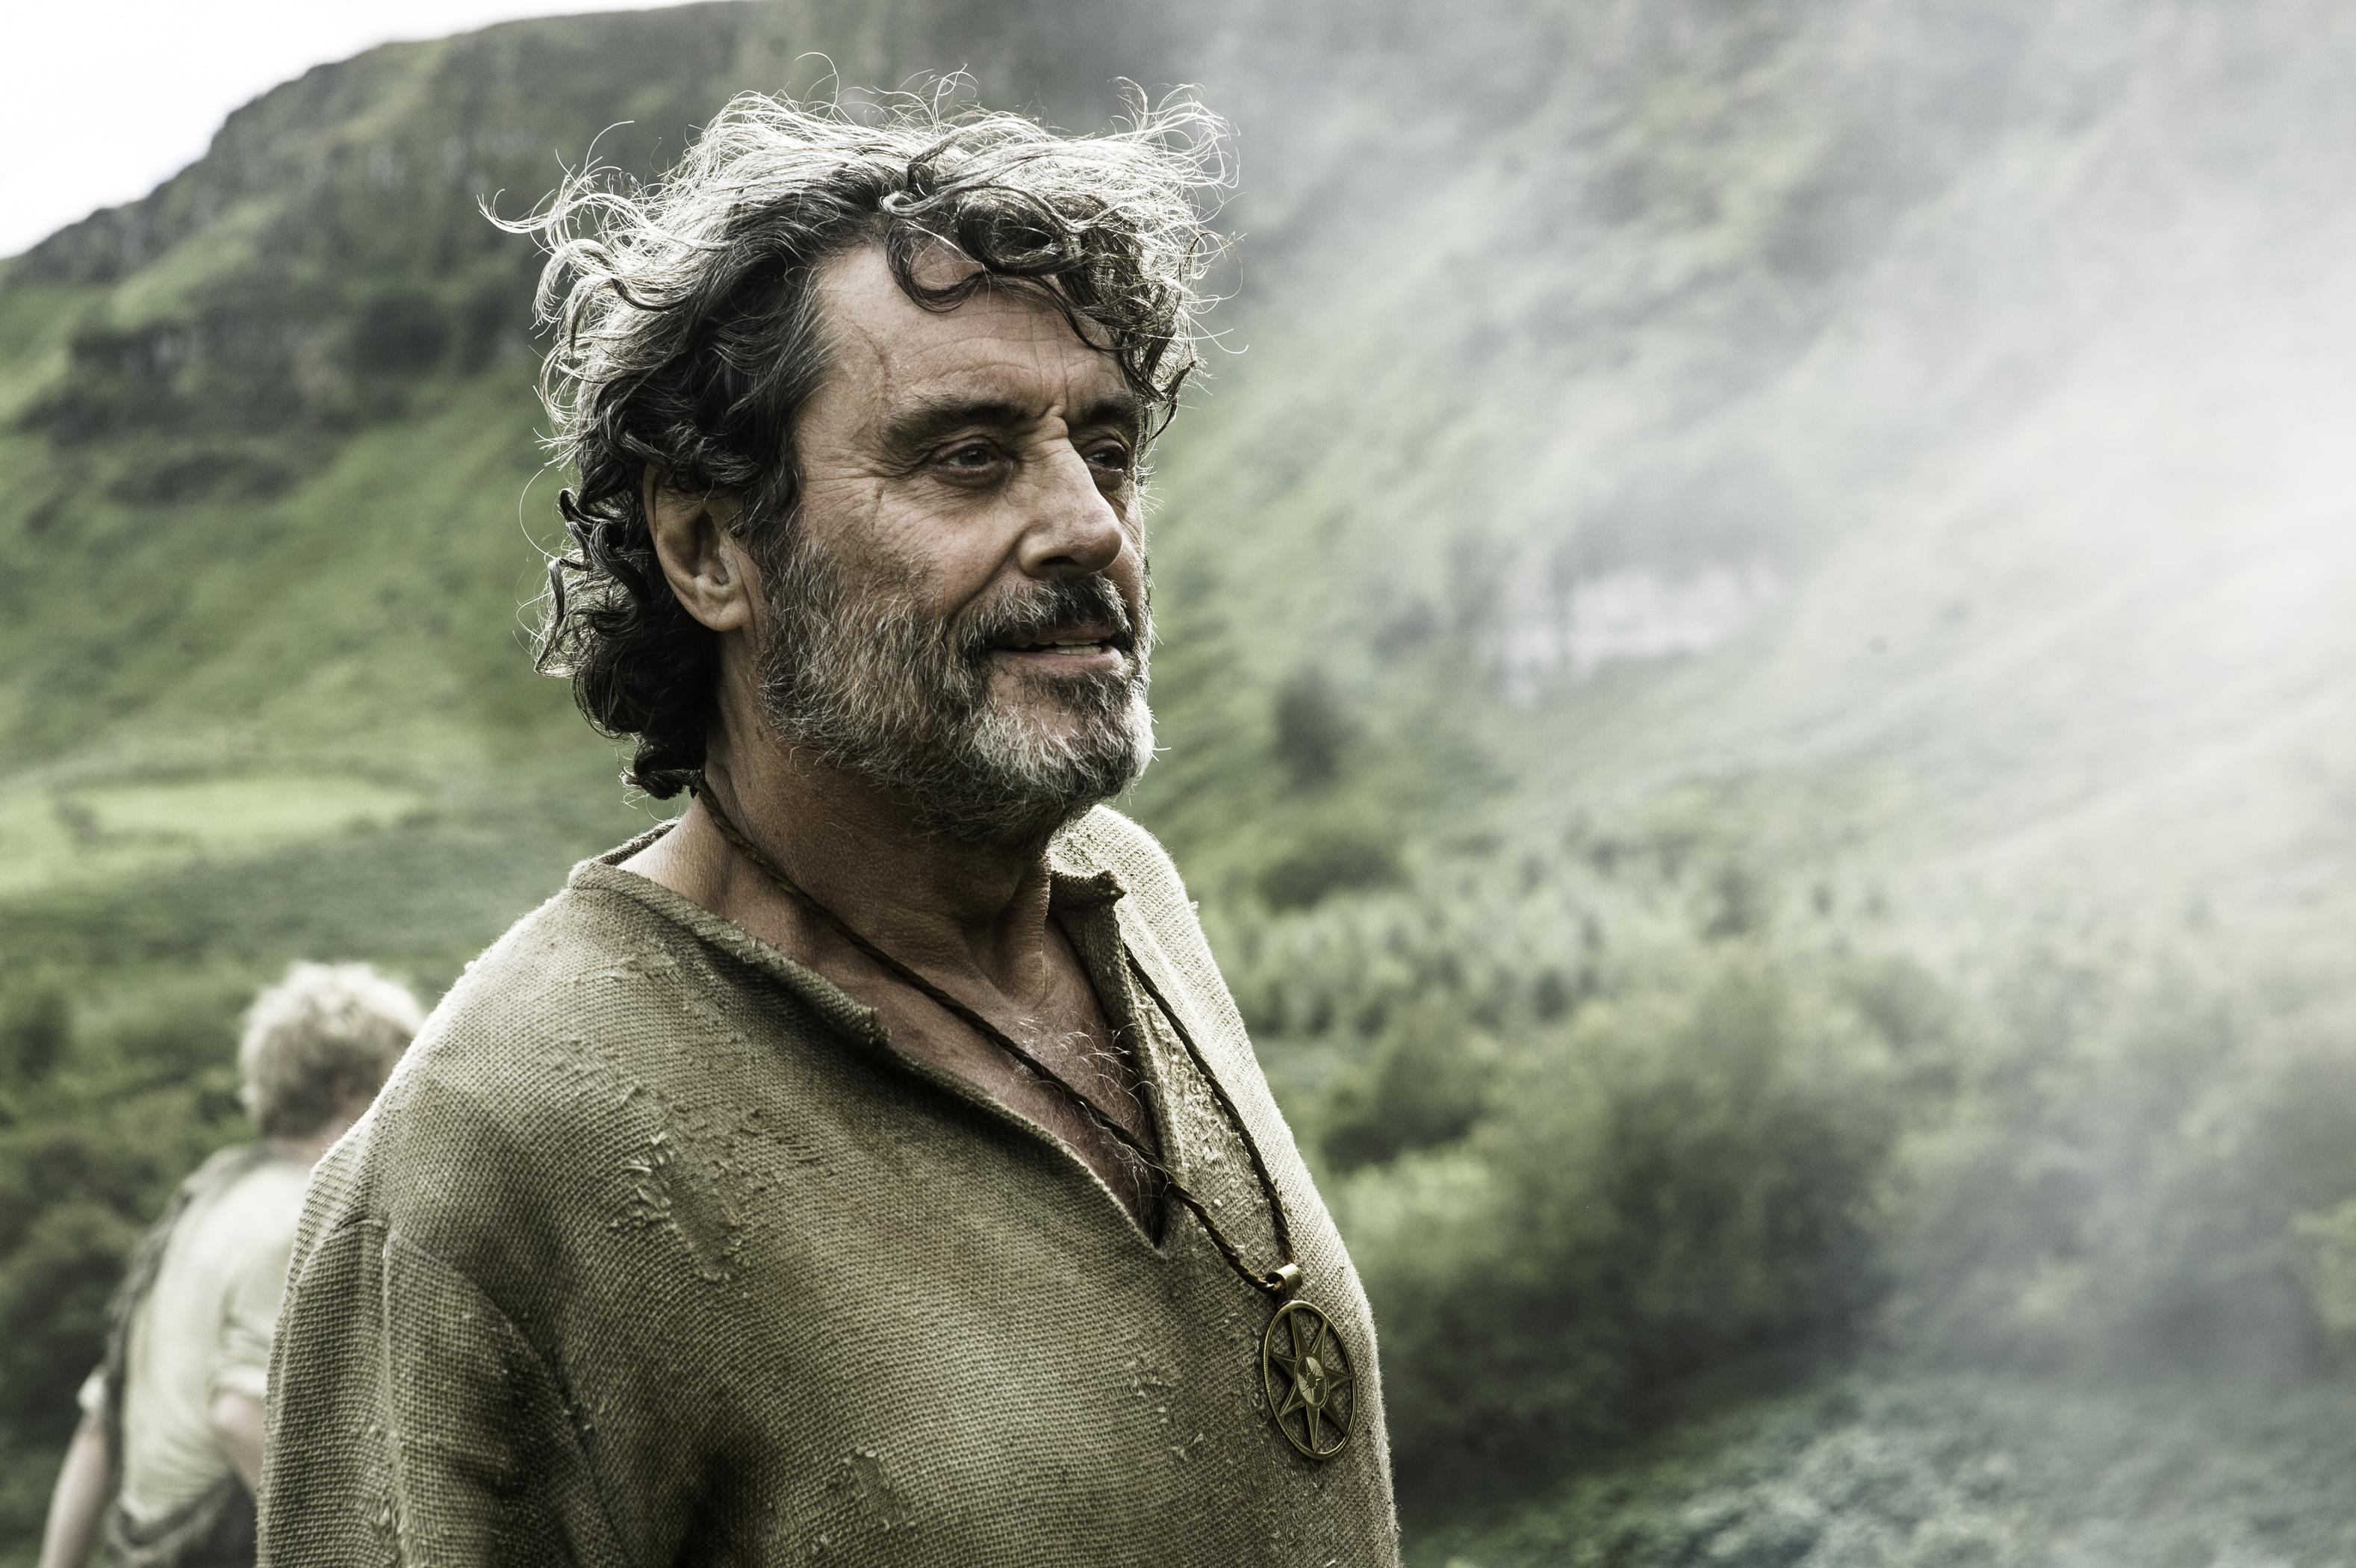 Ian McShane in Game of Thrones